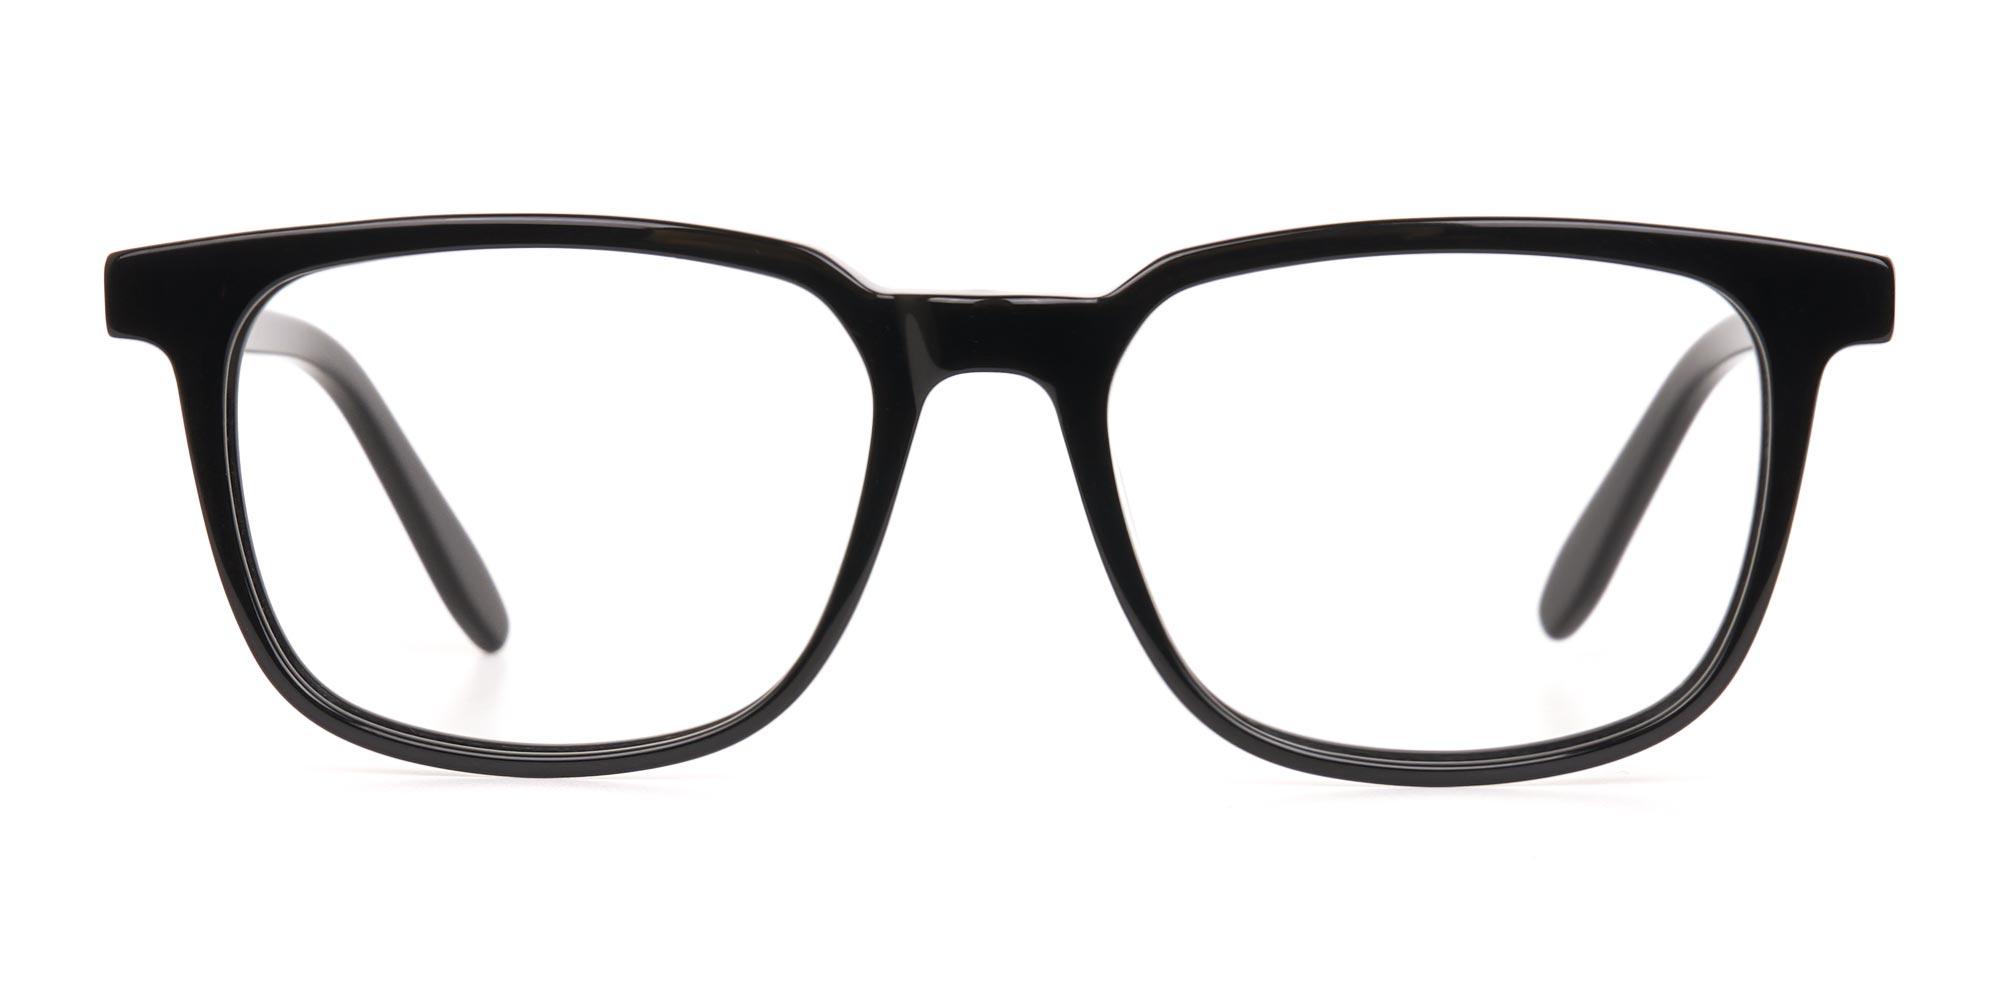 Black Glasses Frame in Rectangle